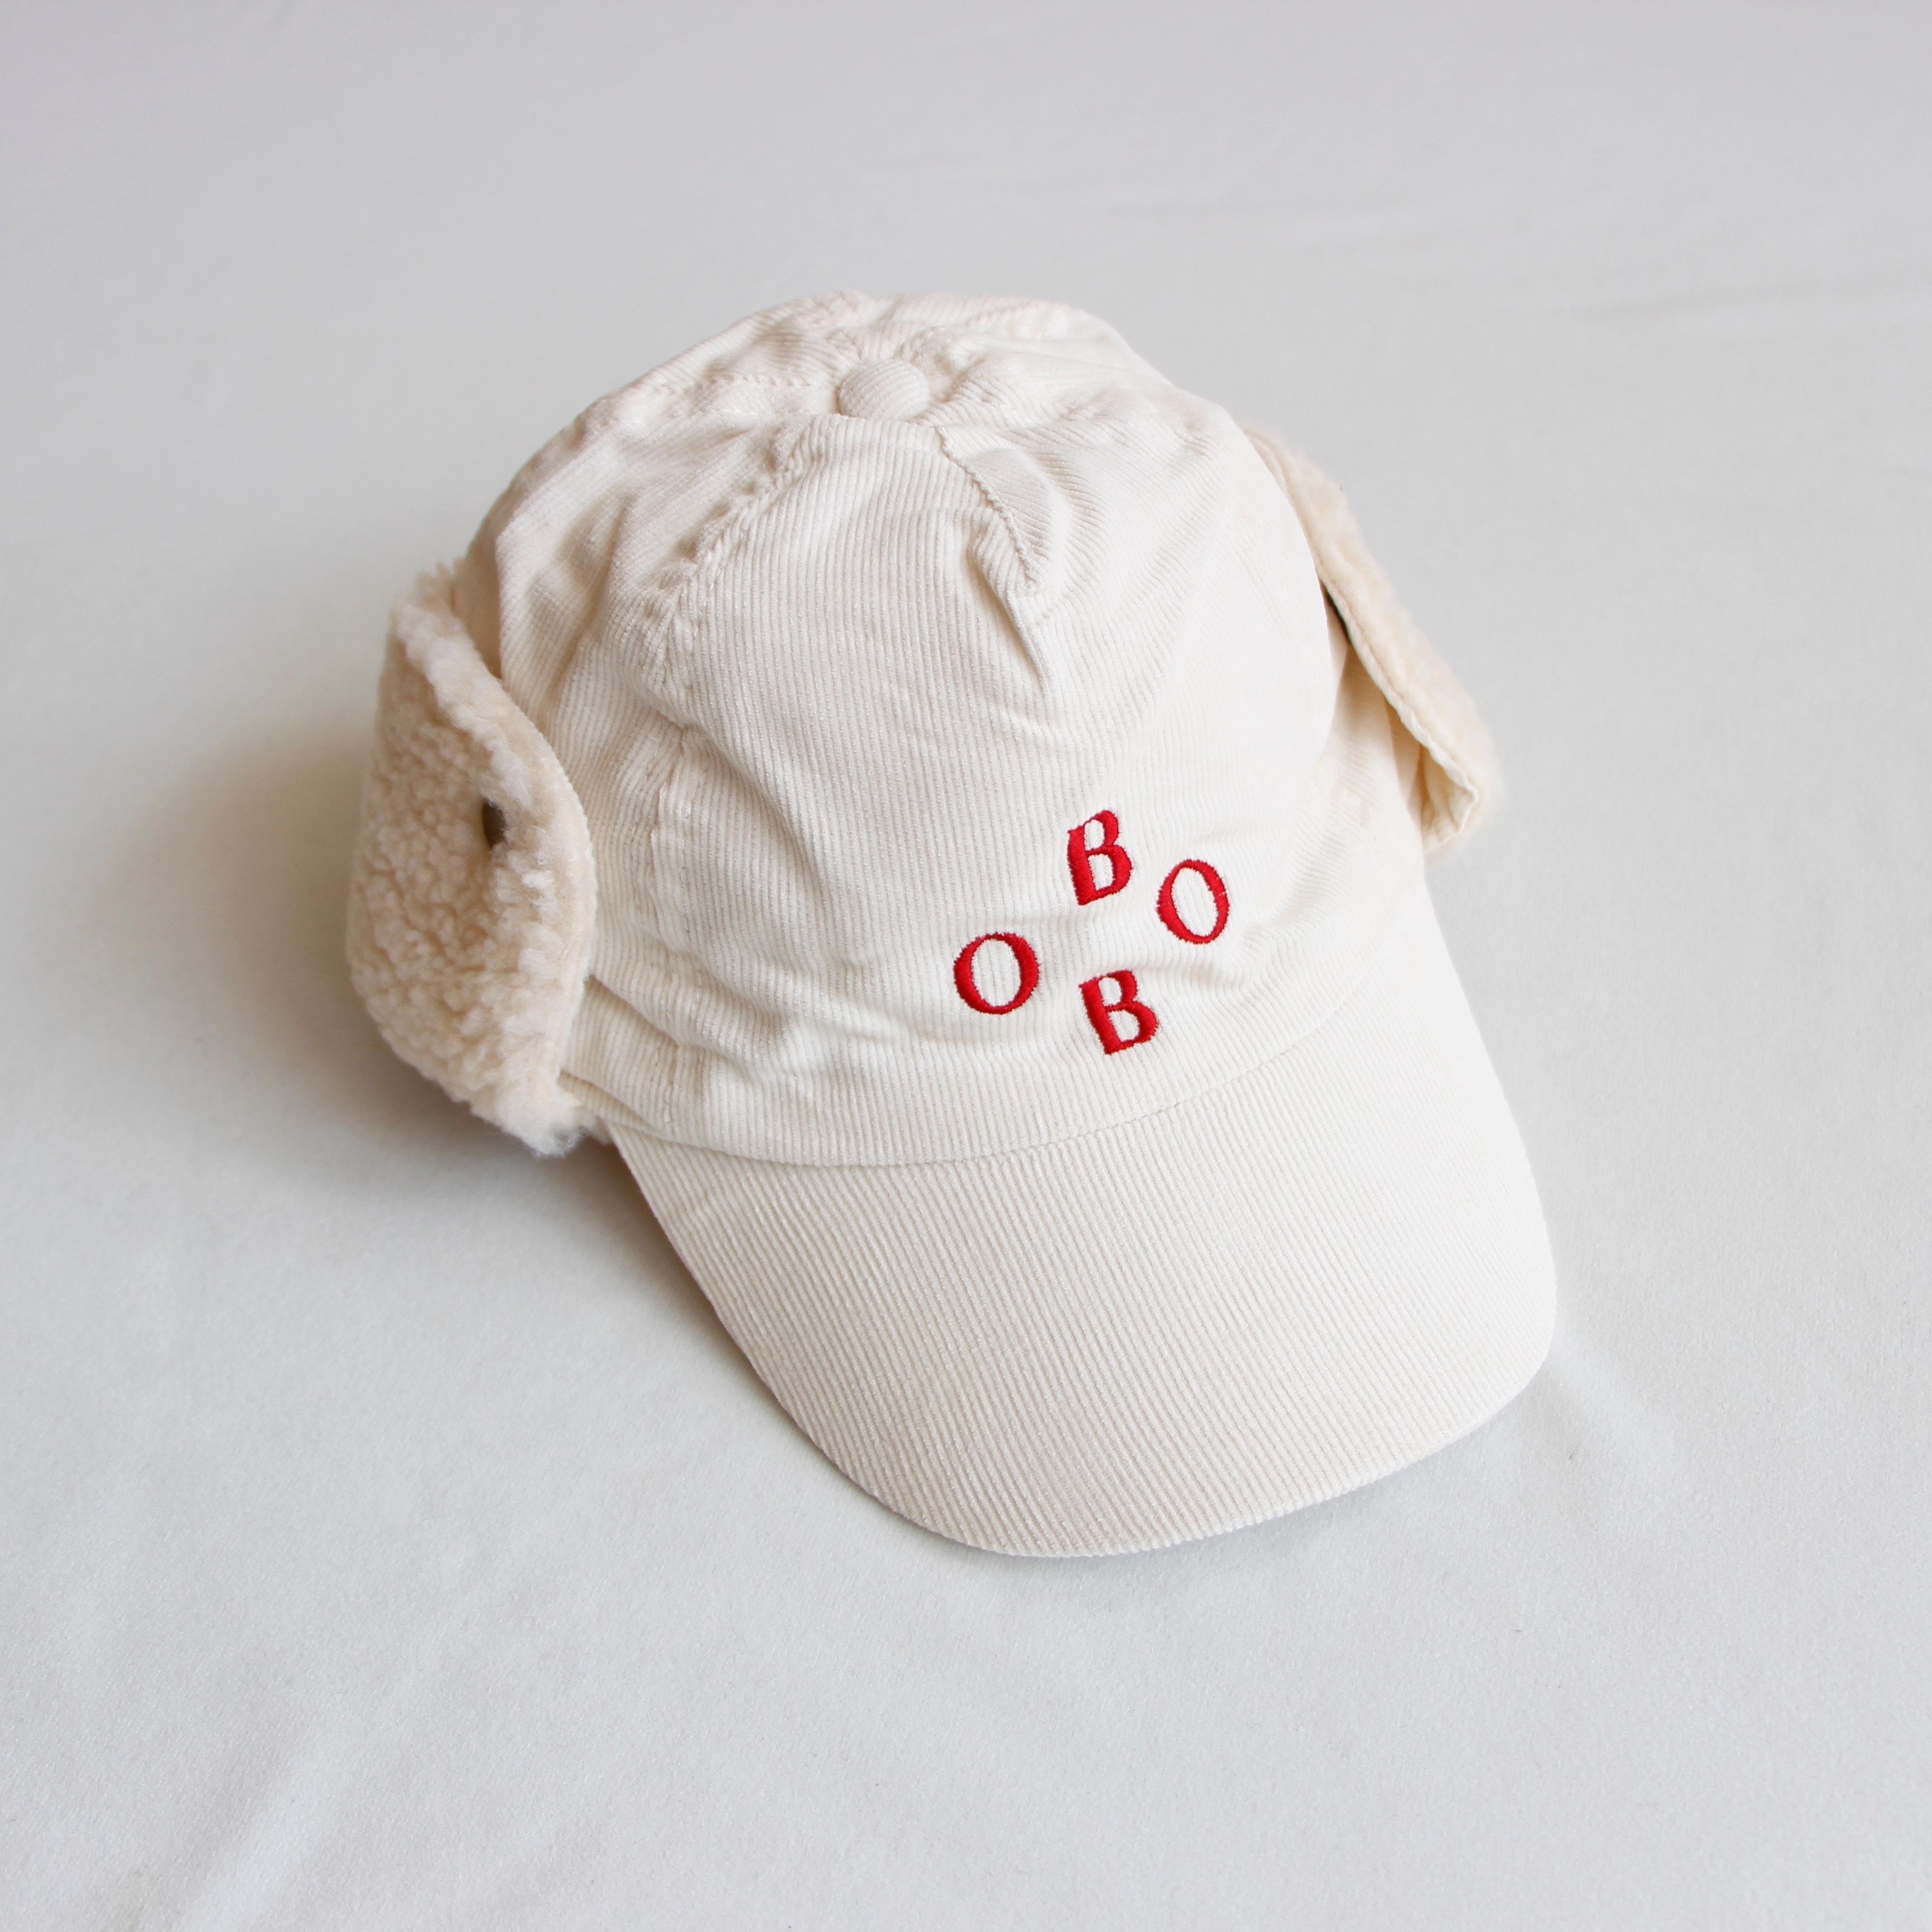 《BOBO CHOSES 2019AW》BOBO Sheepskin cap / kids